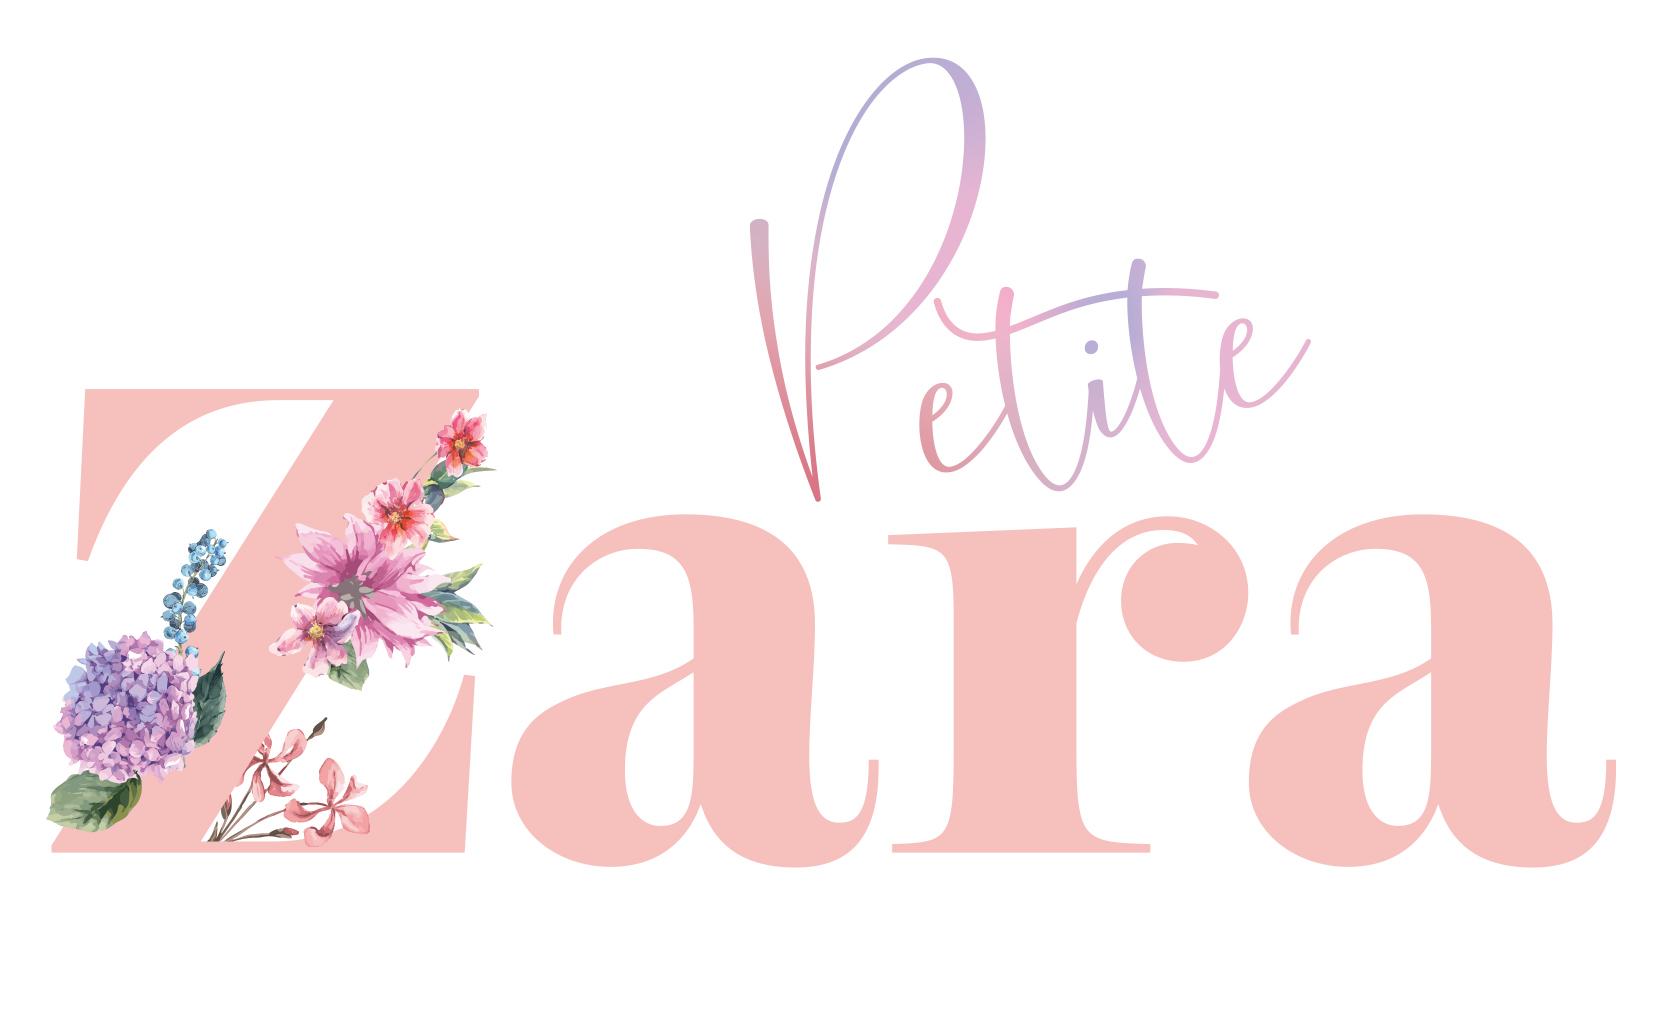 Petite Zara